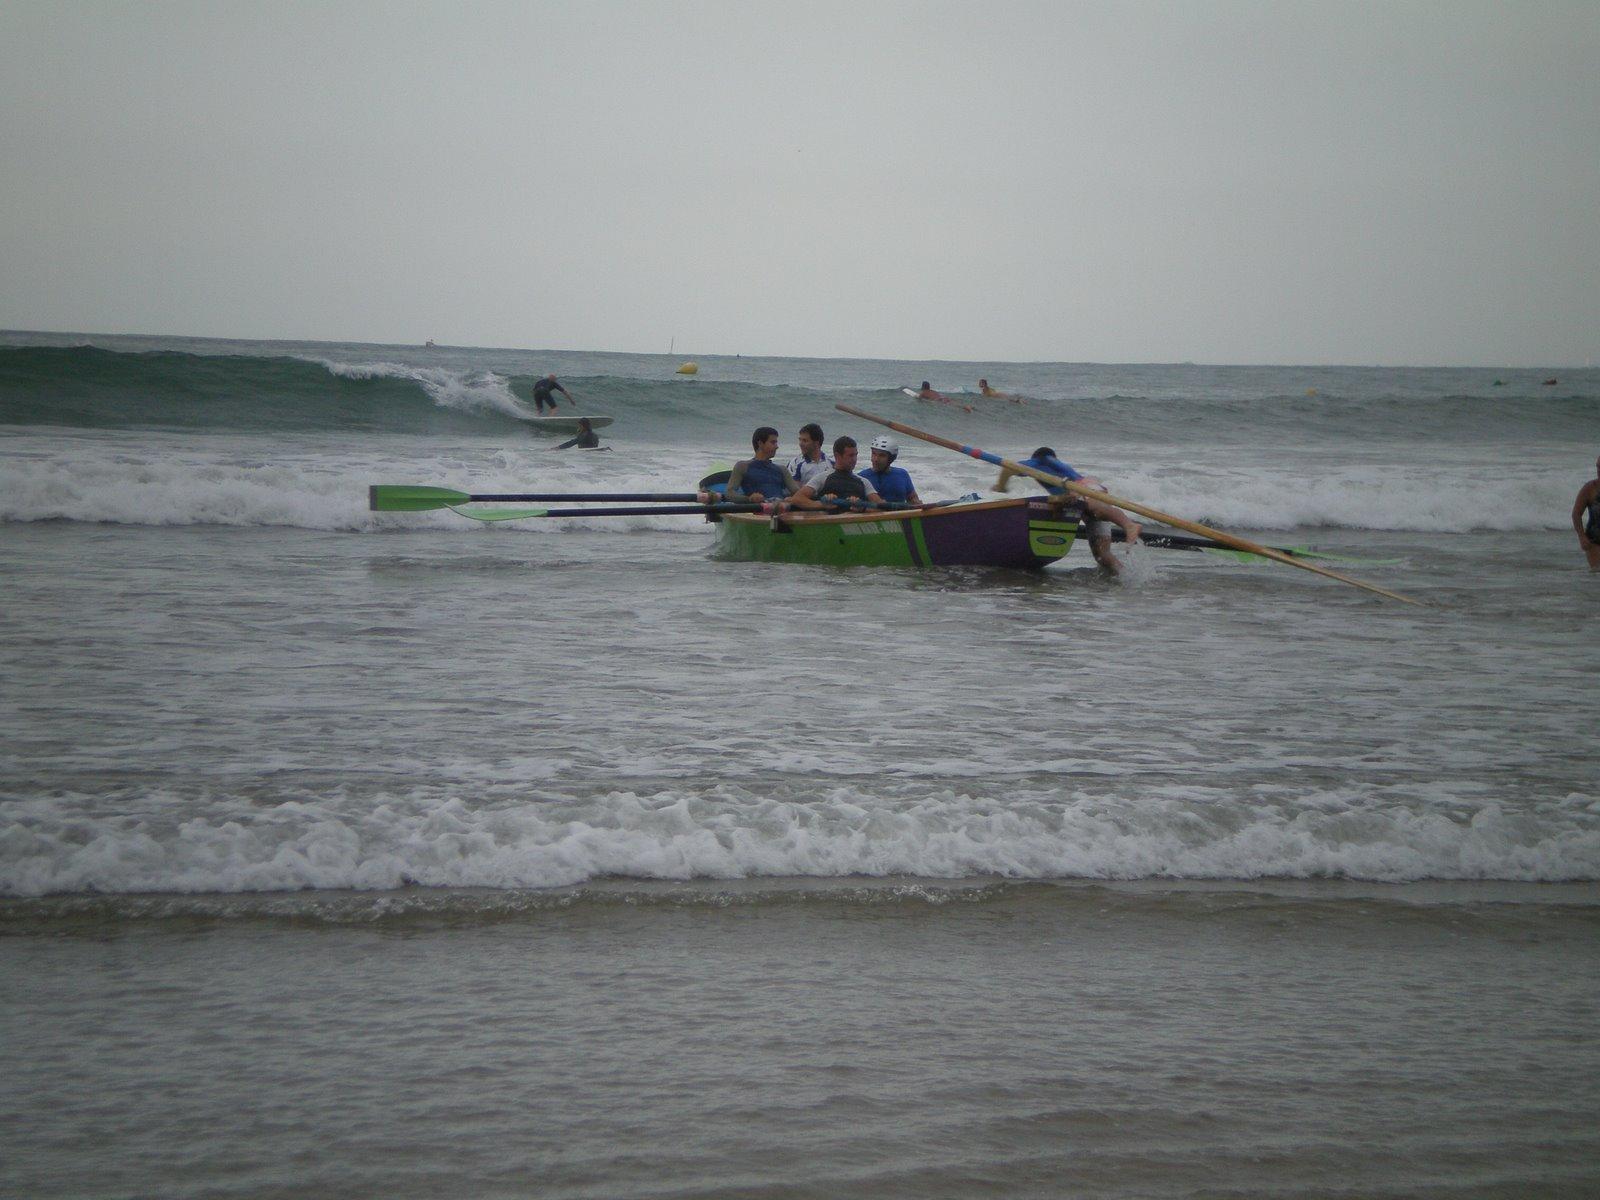 OCEAN THUNDER BIARRITZ